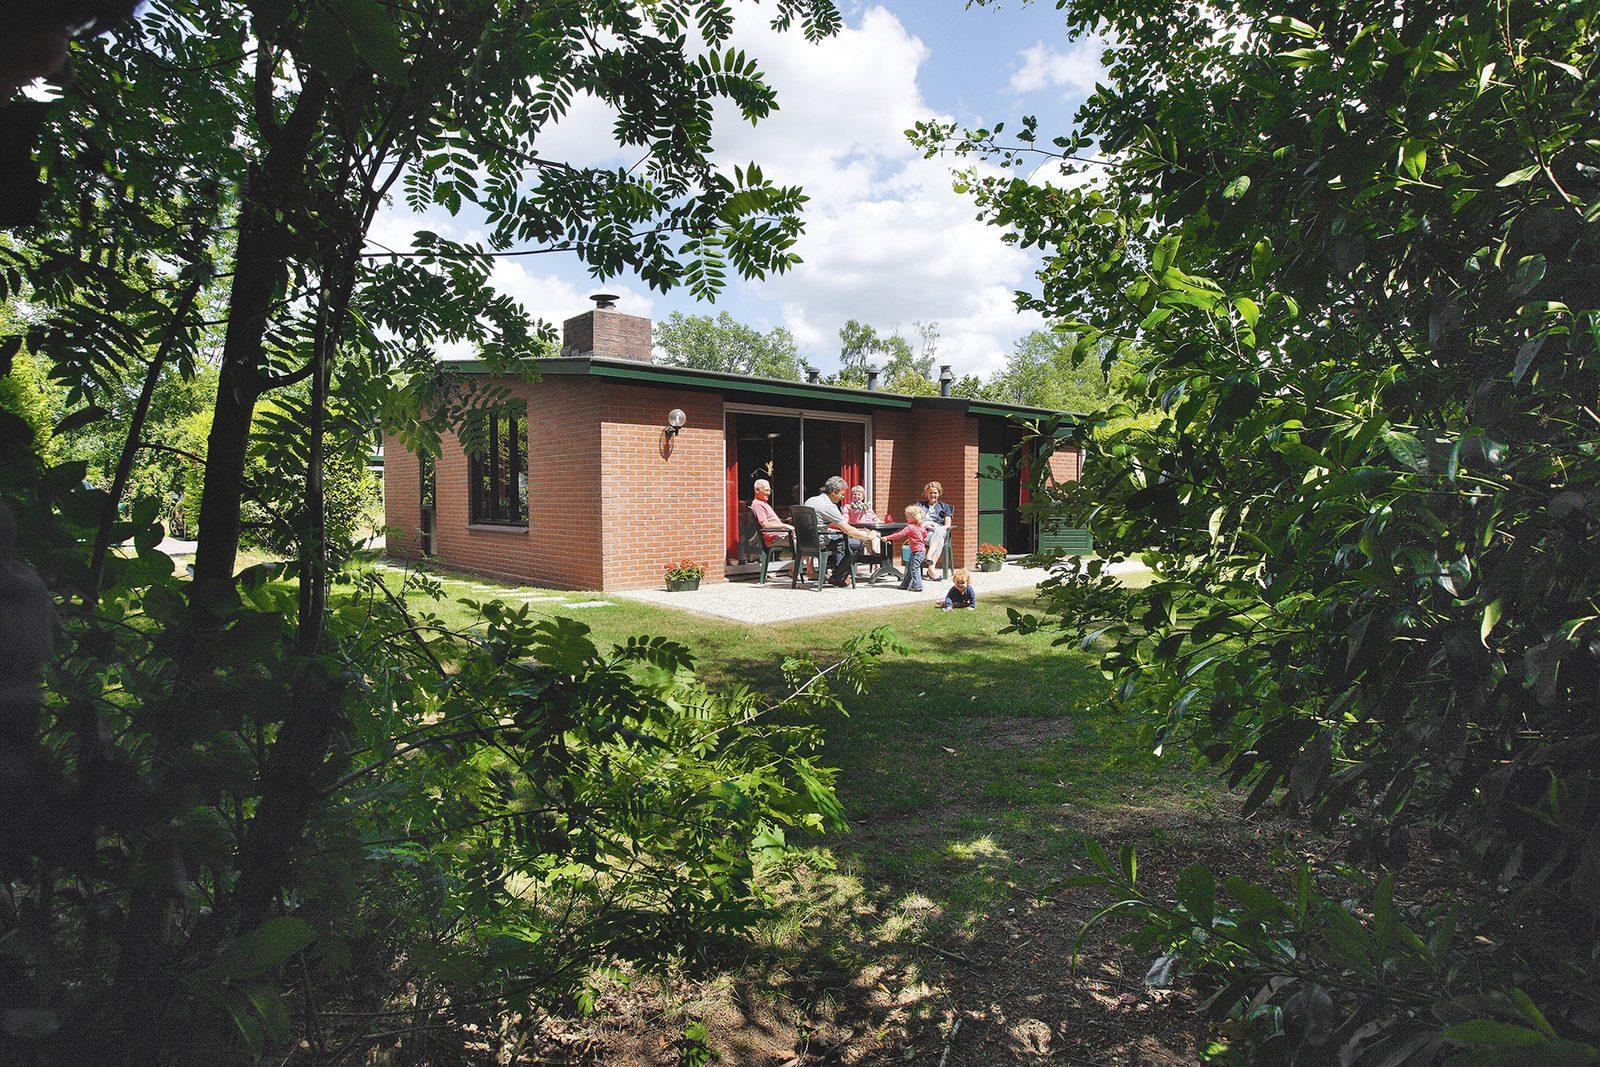 Ferienhaus in Overijssel